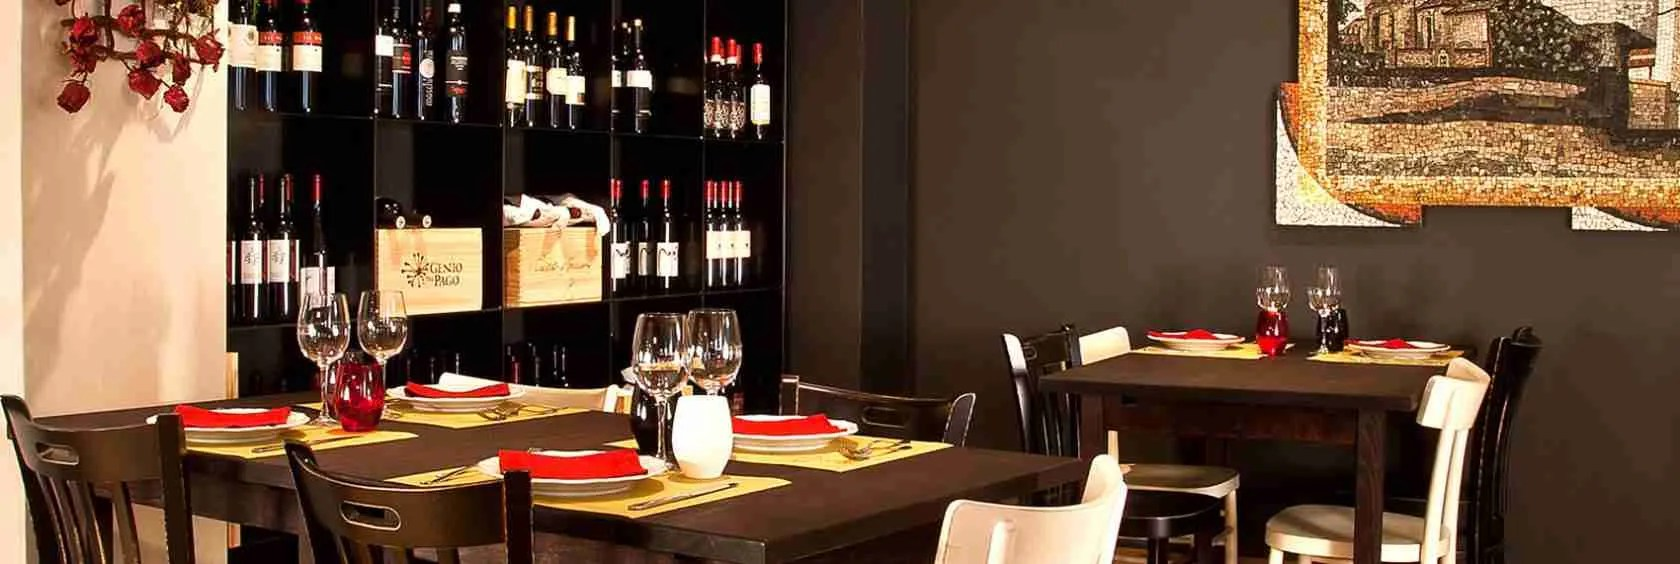 Osterie friulane, i luoghi perfetti per una cena in compagnia di una escort Udine.